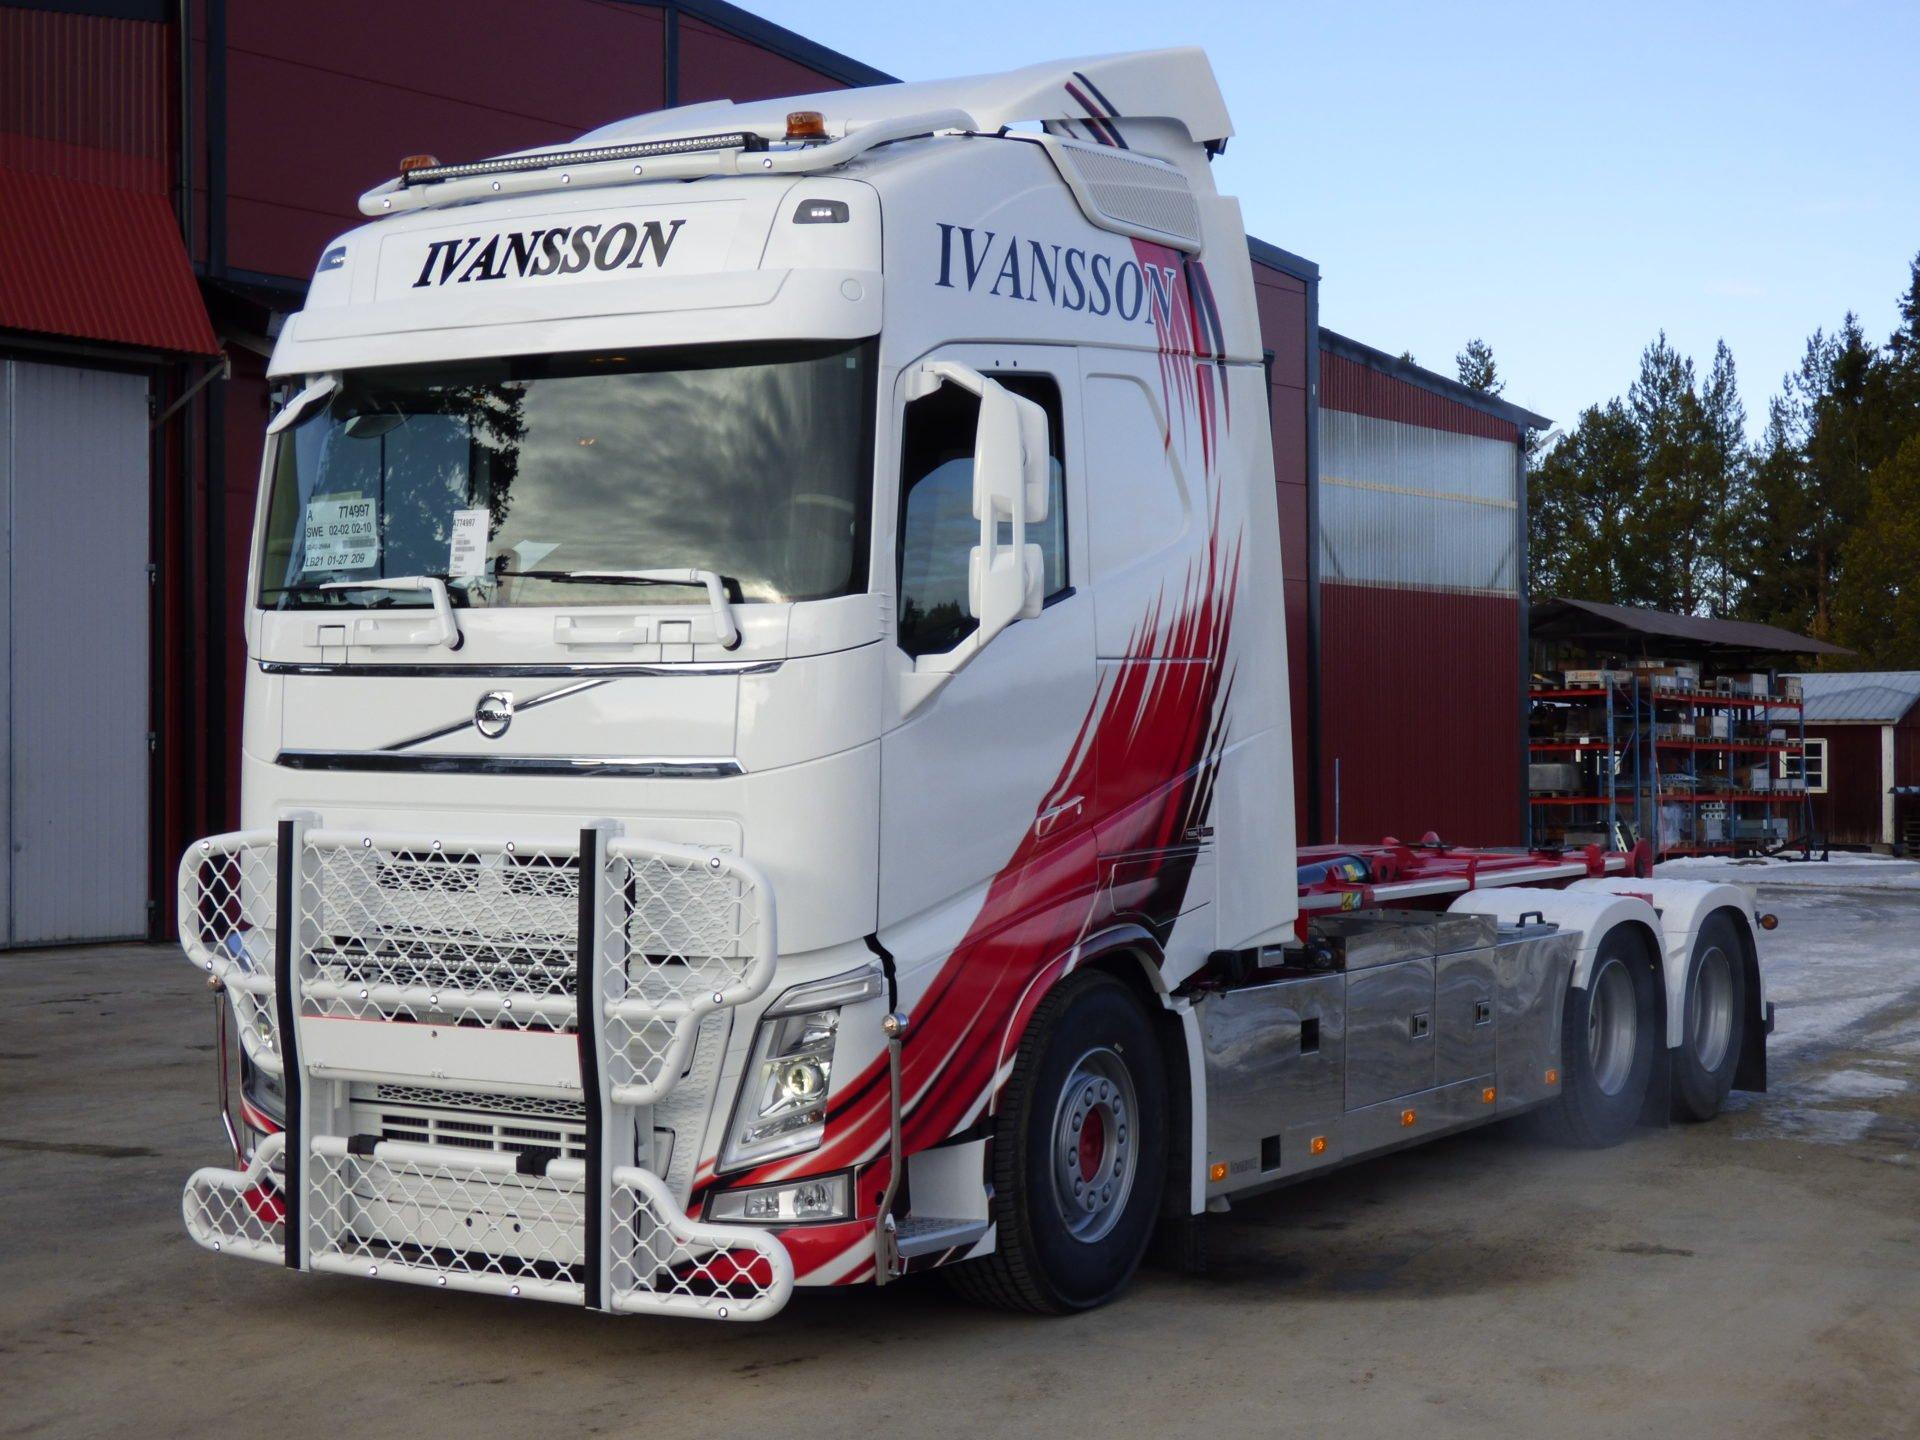 1512451 Ivansson (4)